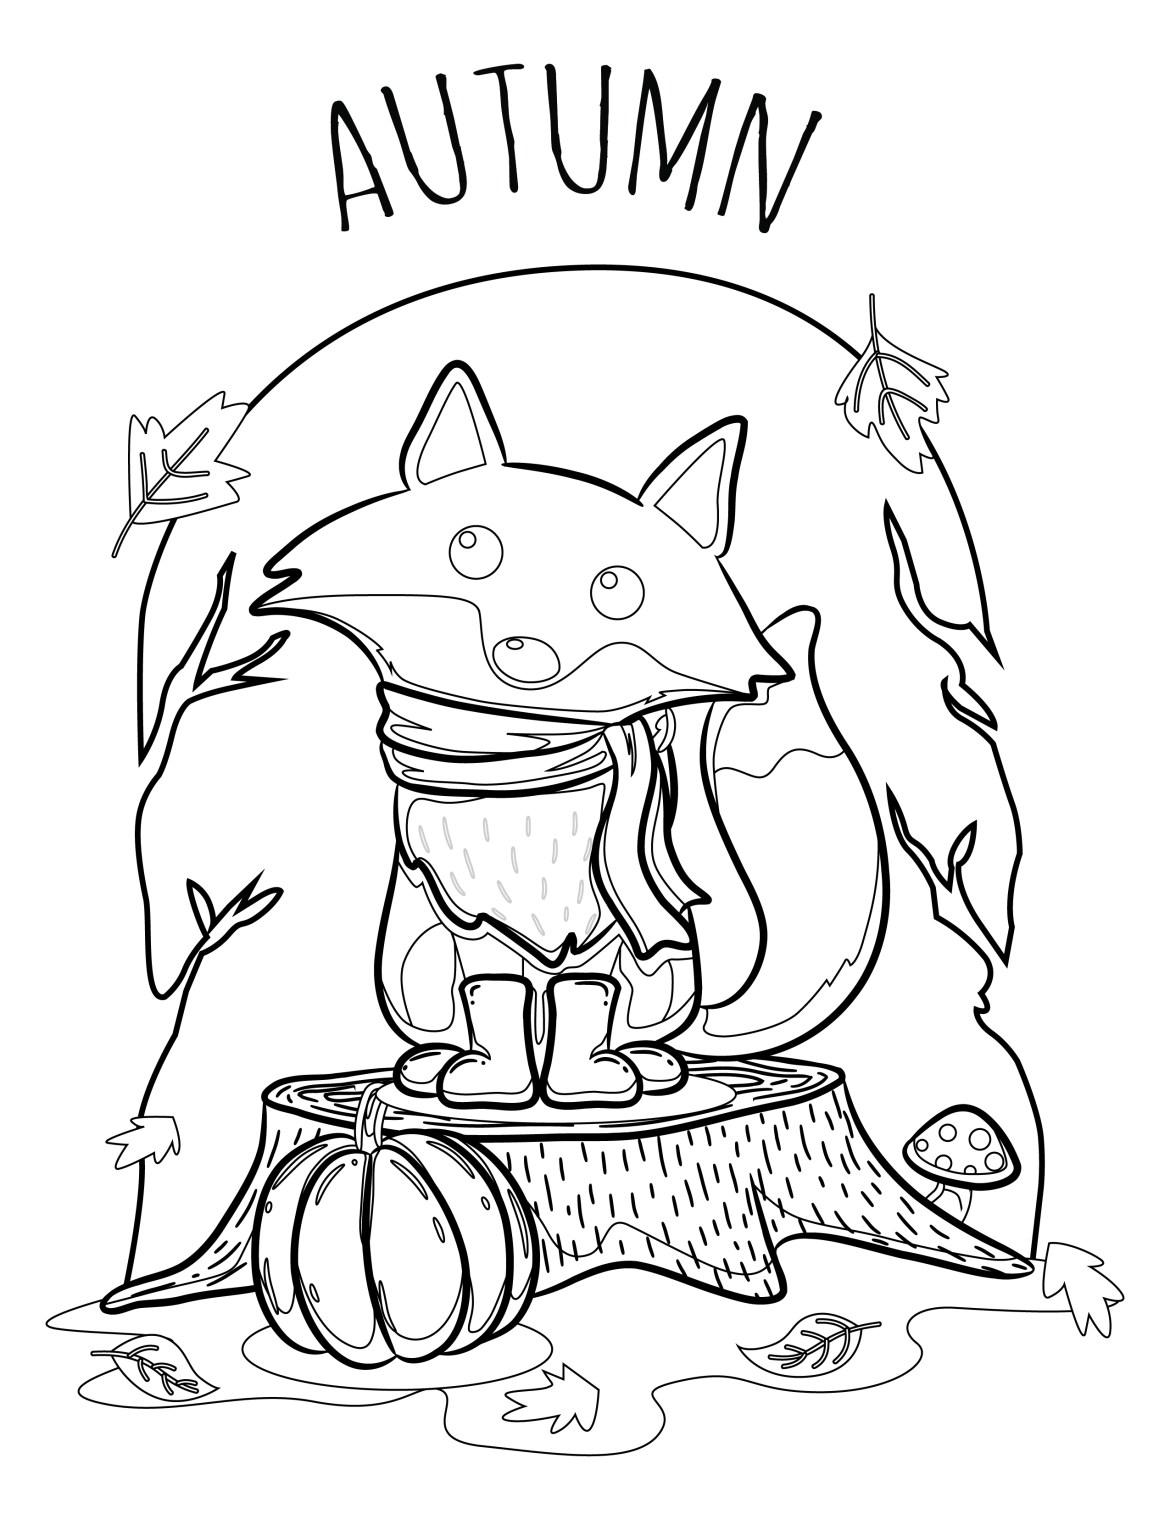 Bienvenue automne coloriage renard pour adulte - Artherapie.ca